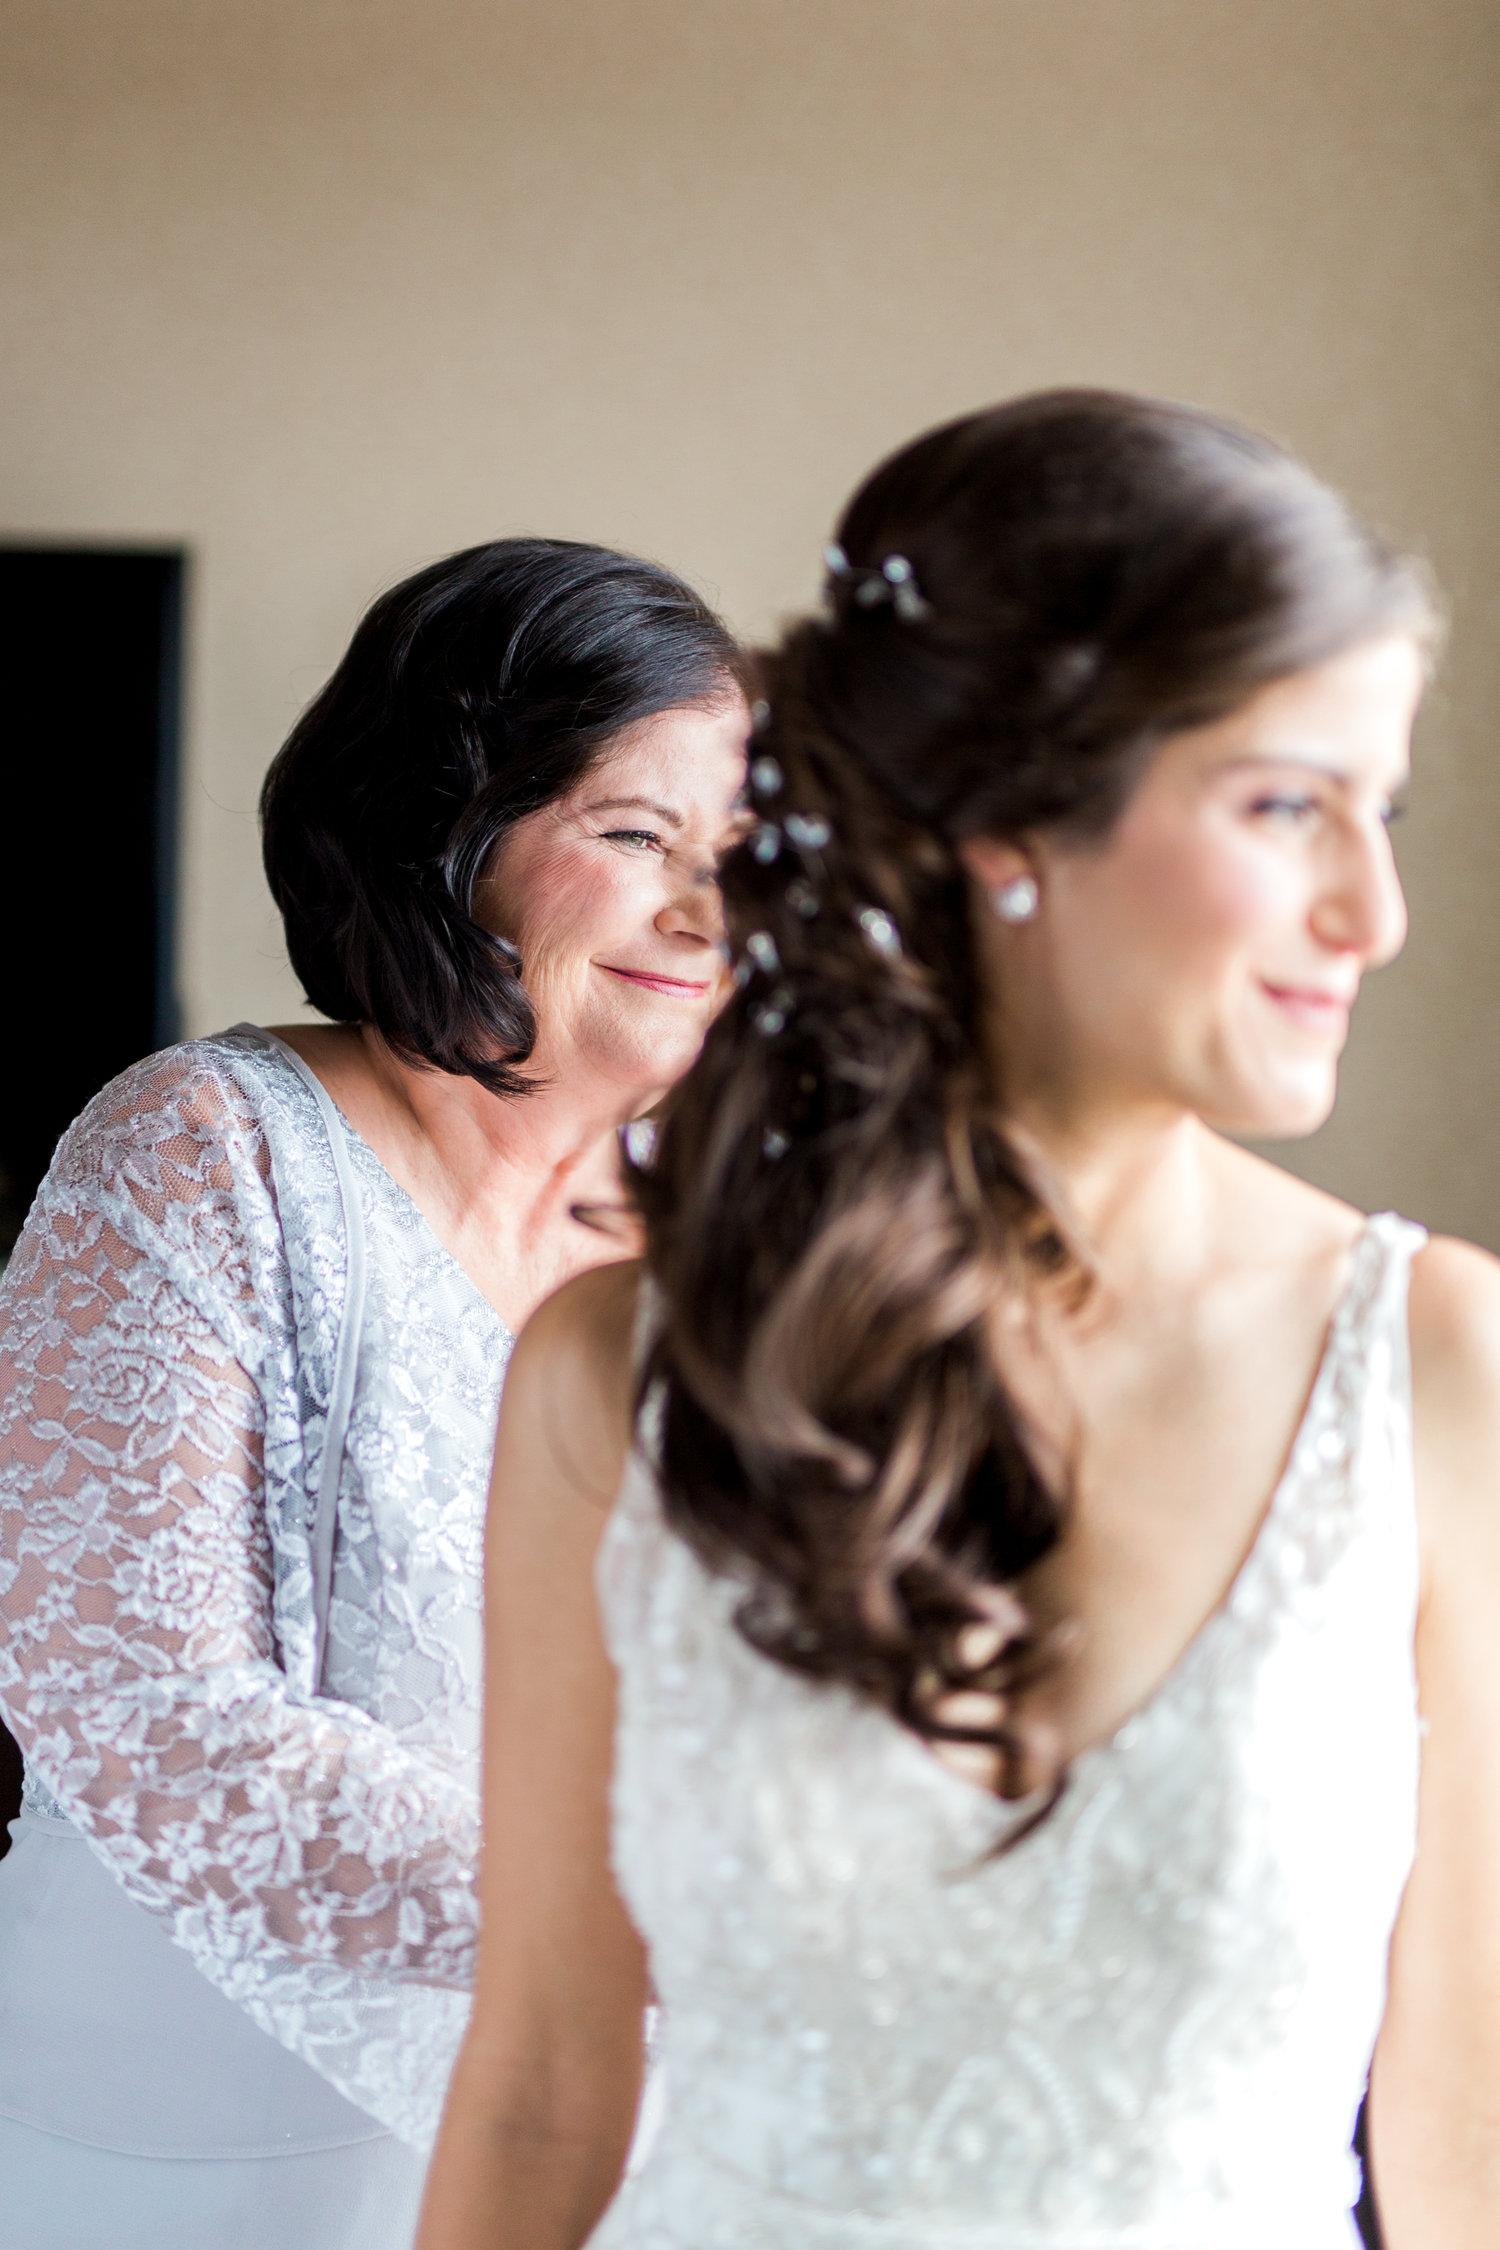 Amir-Golbazi-Danielle-Giroux-Photography_Toronto-Wedding_Cedarwood_Rachel-Paul_087.jpg